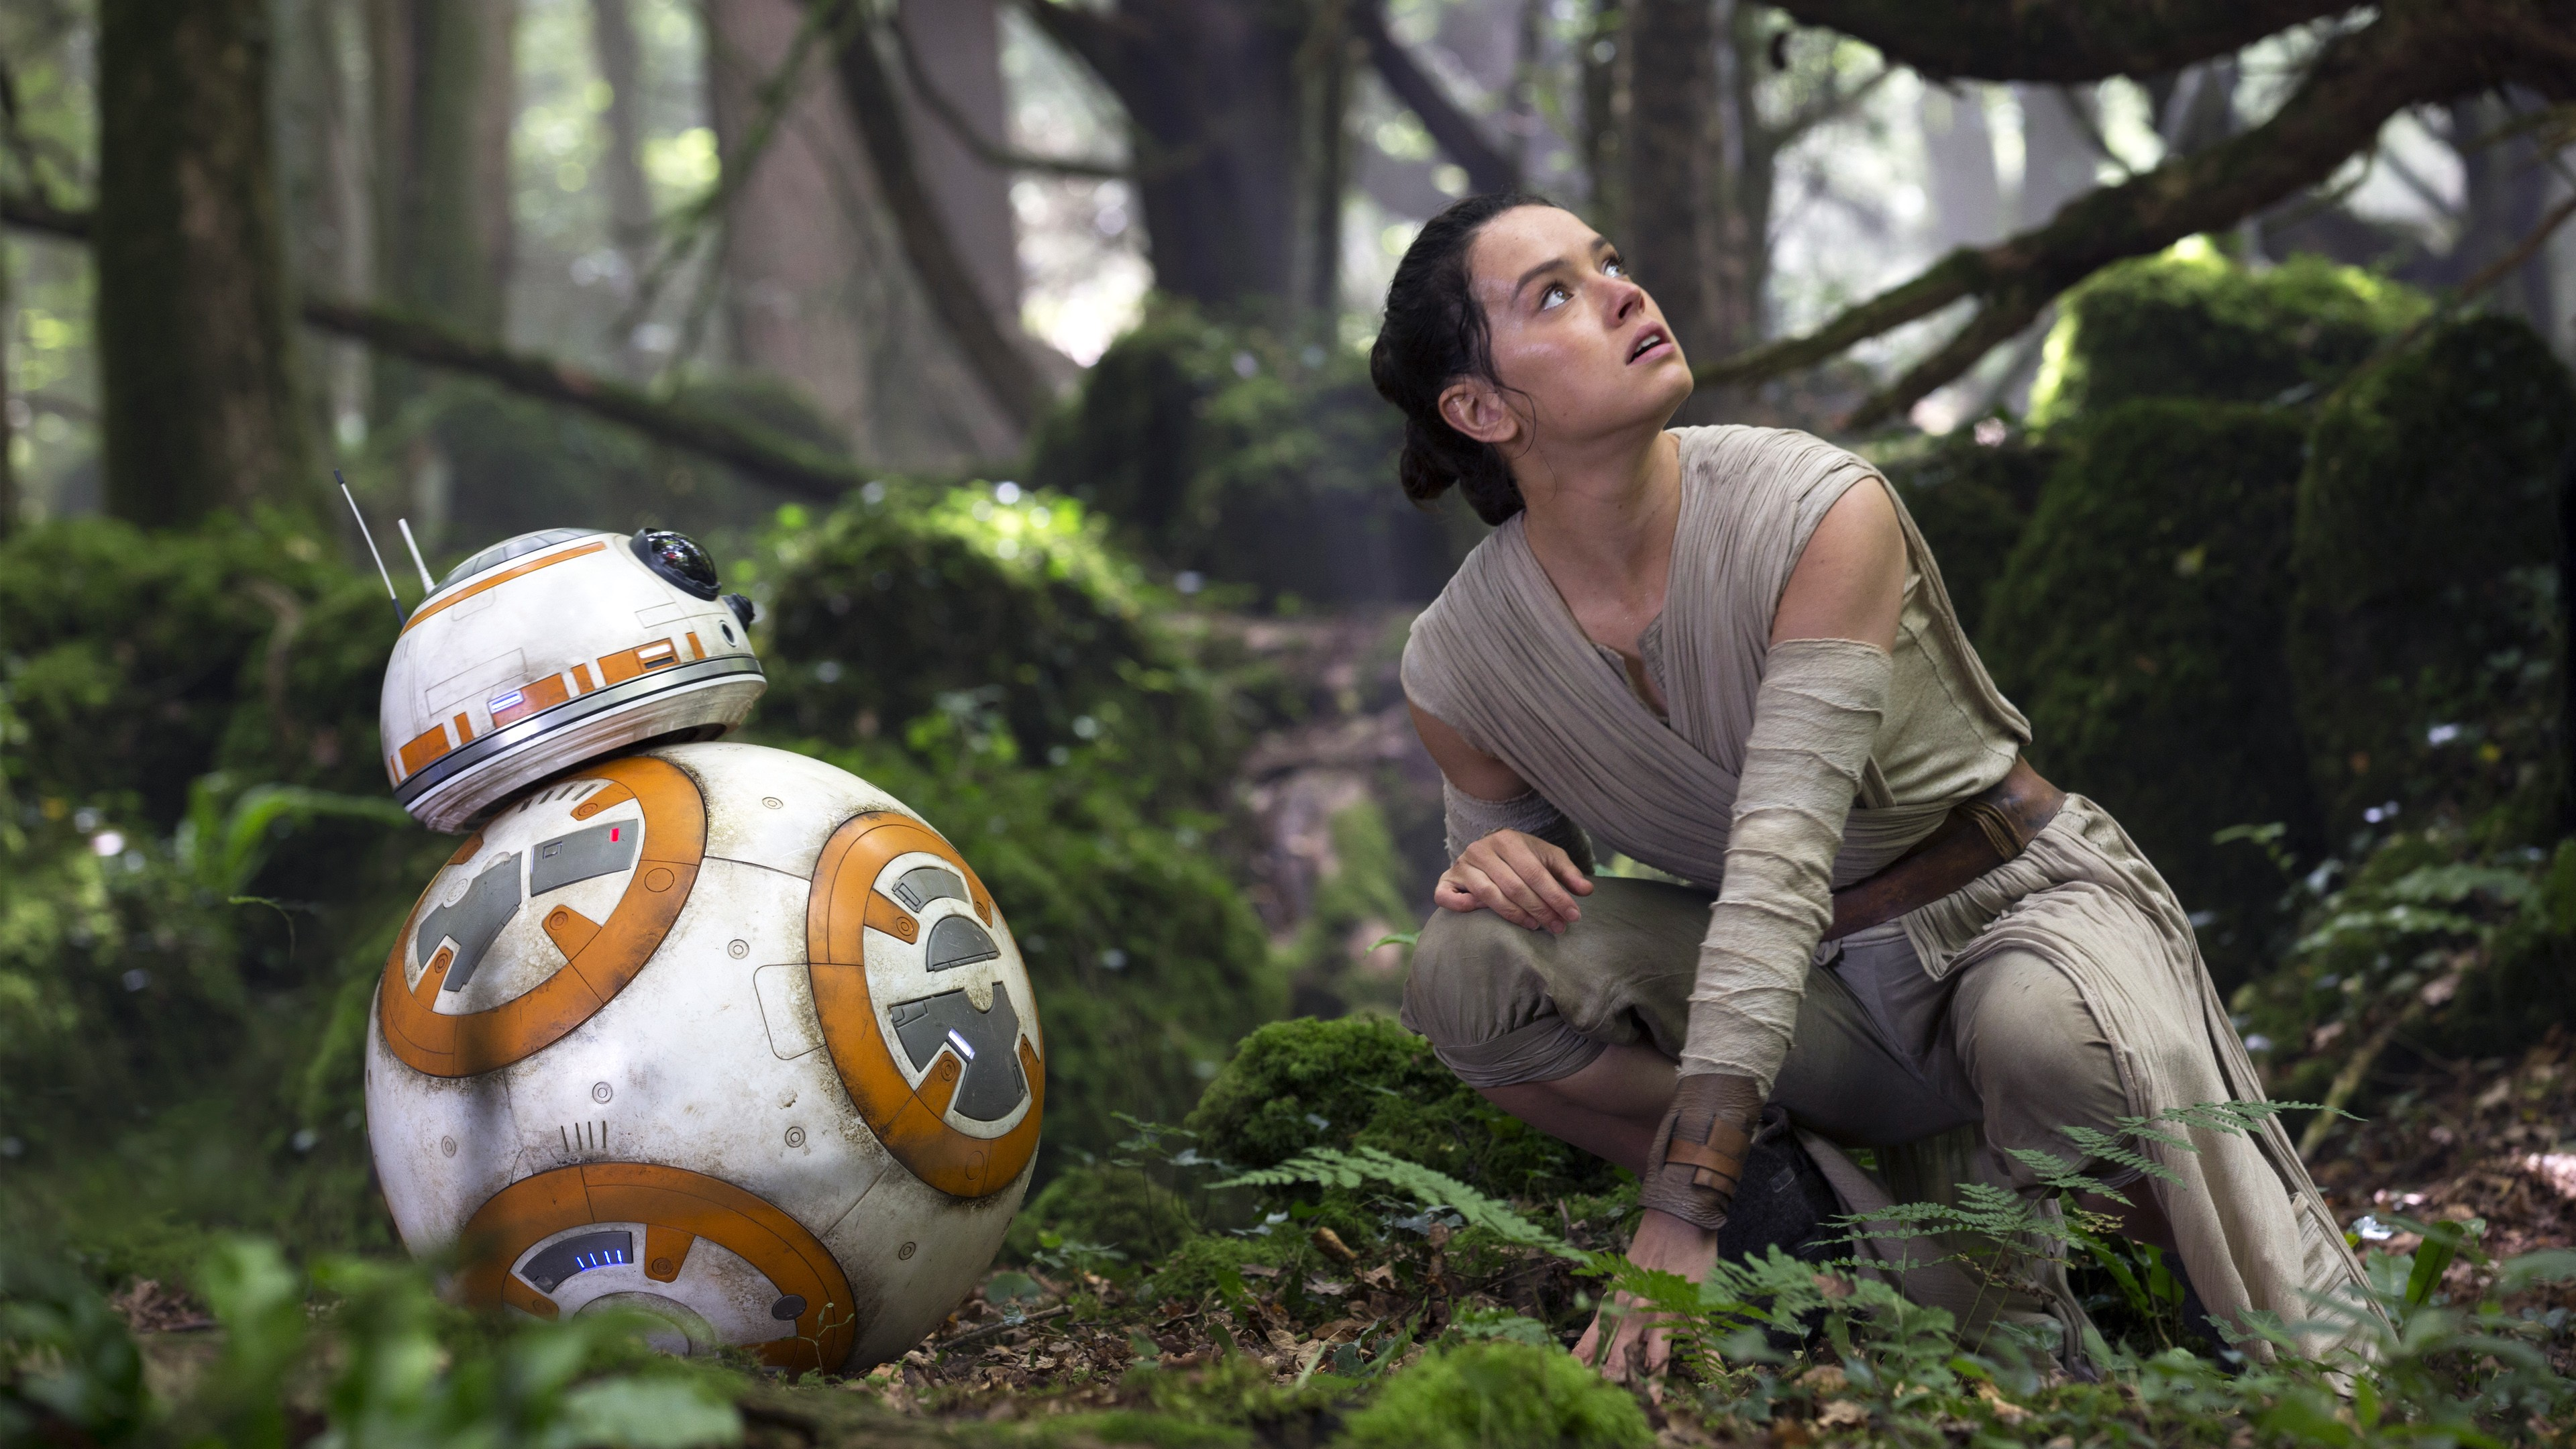 Rey (Star Wars Episode 8 The Last Jedi) - Daisy Rey Photo